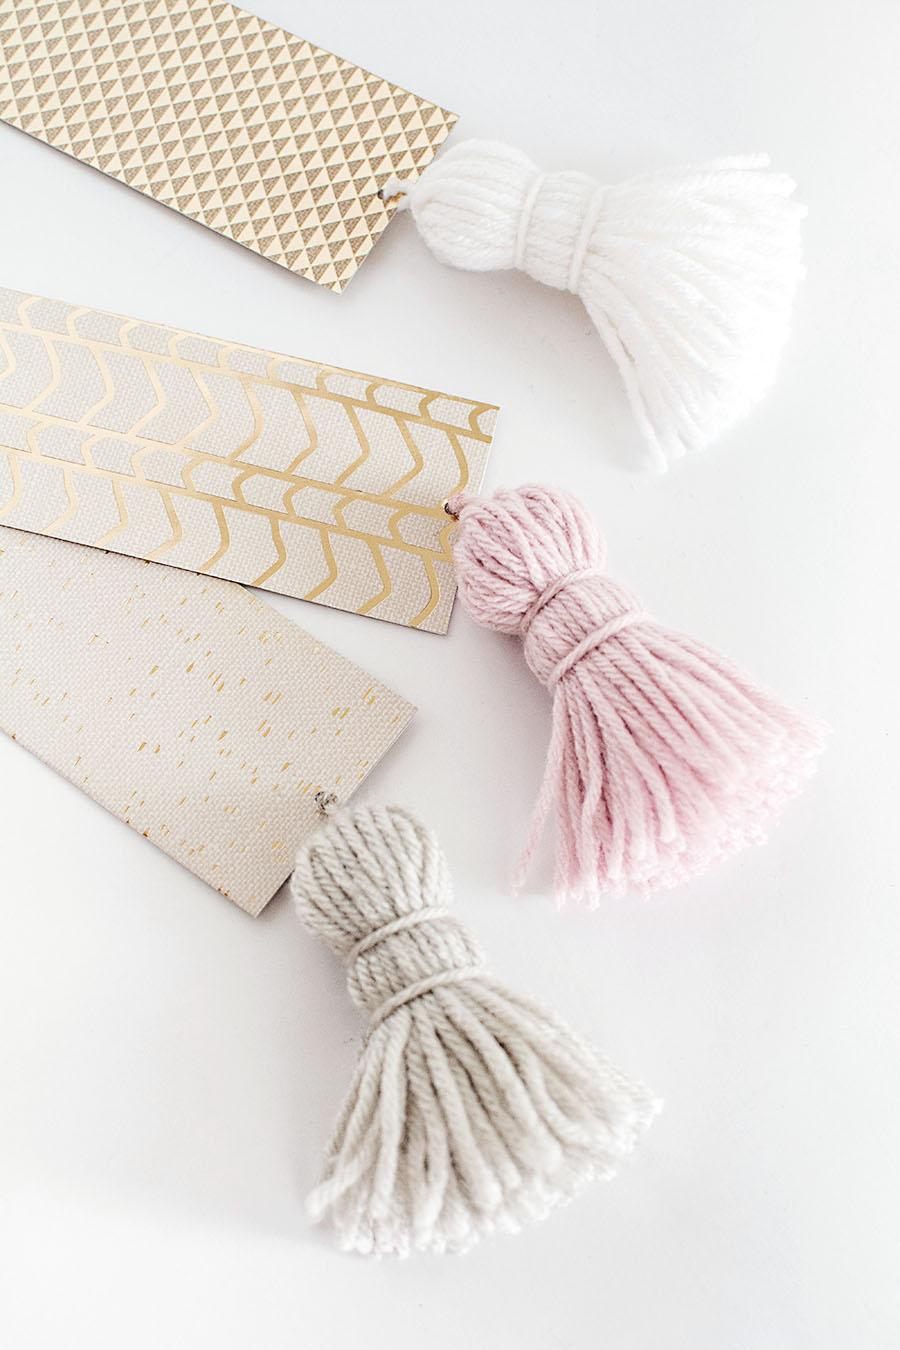 DIY-Chunky Tassel Bookmarks